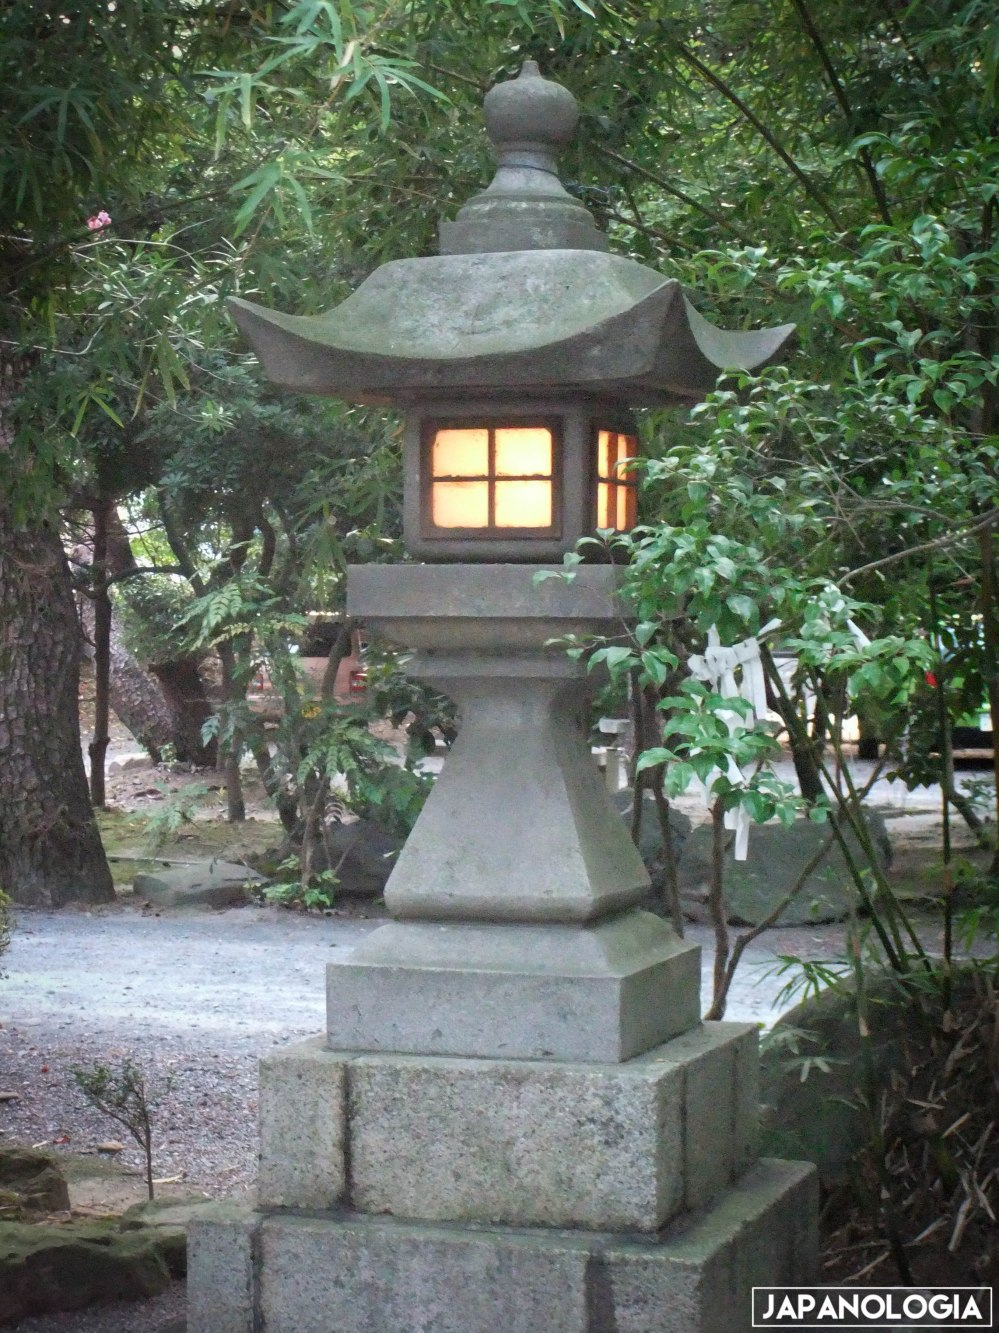 Tōrō (灯籠)